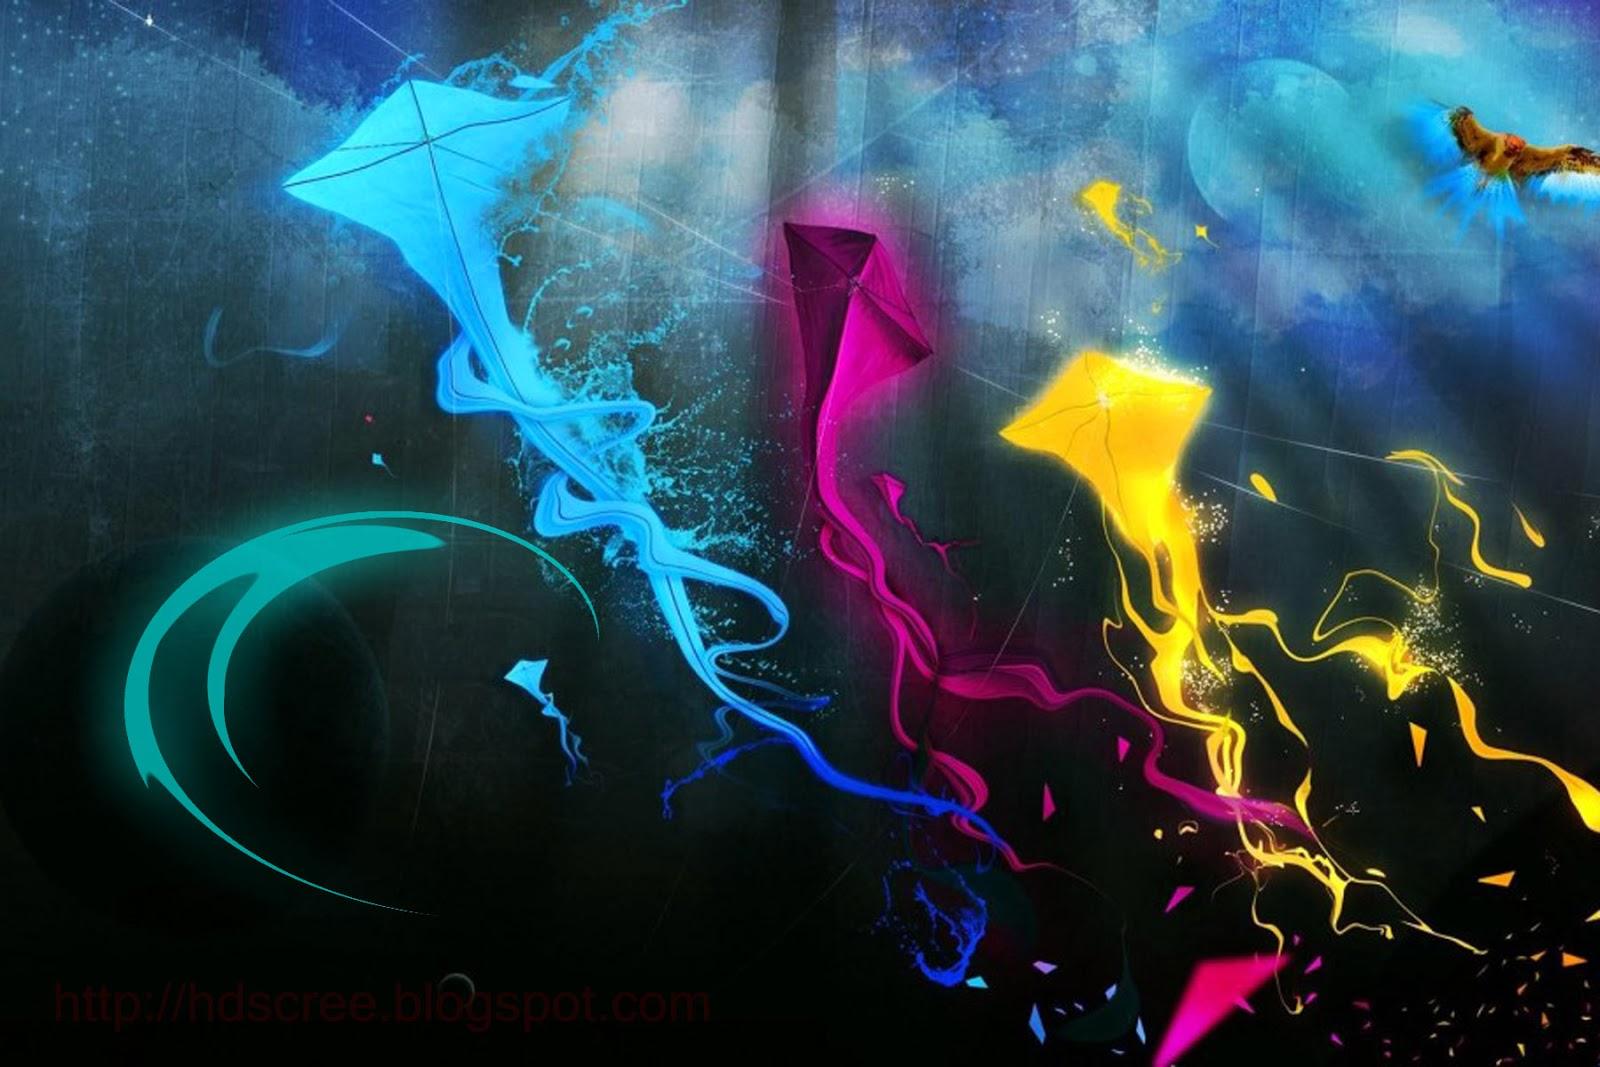 Cool Hd Wallpapers Hd Wallpaper Hd Screensaver Hd